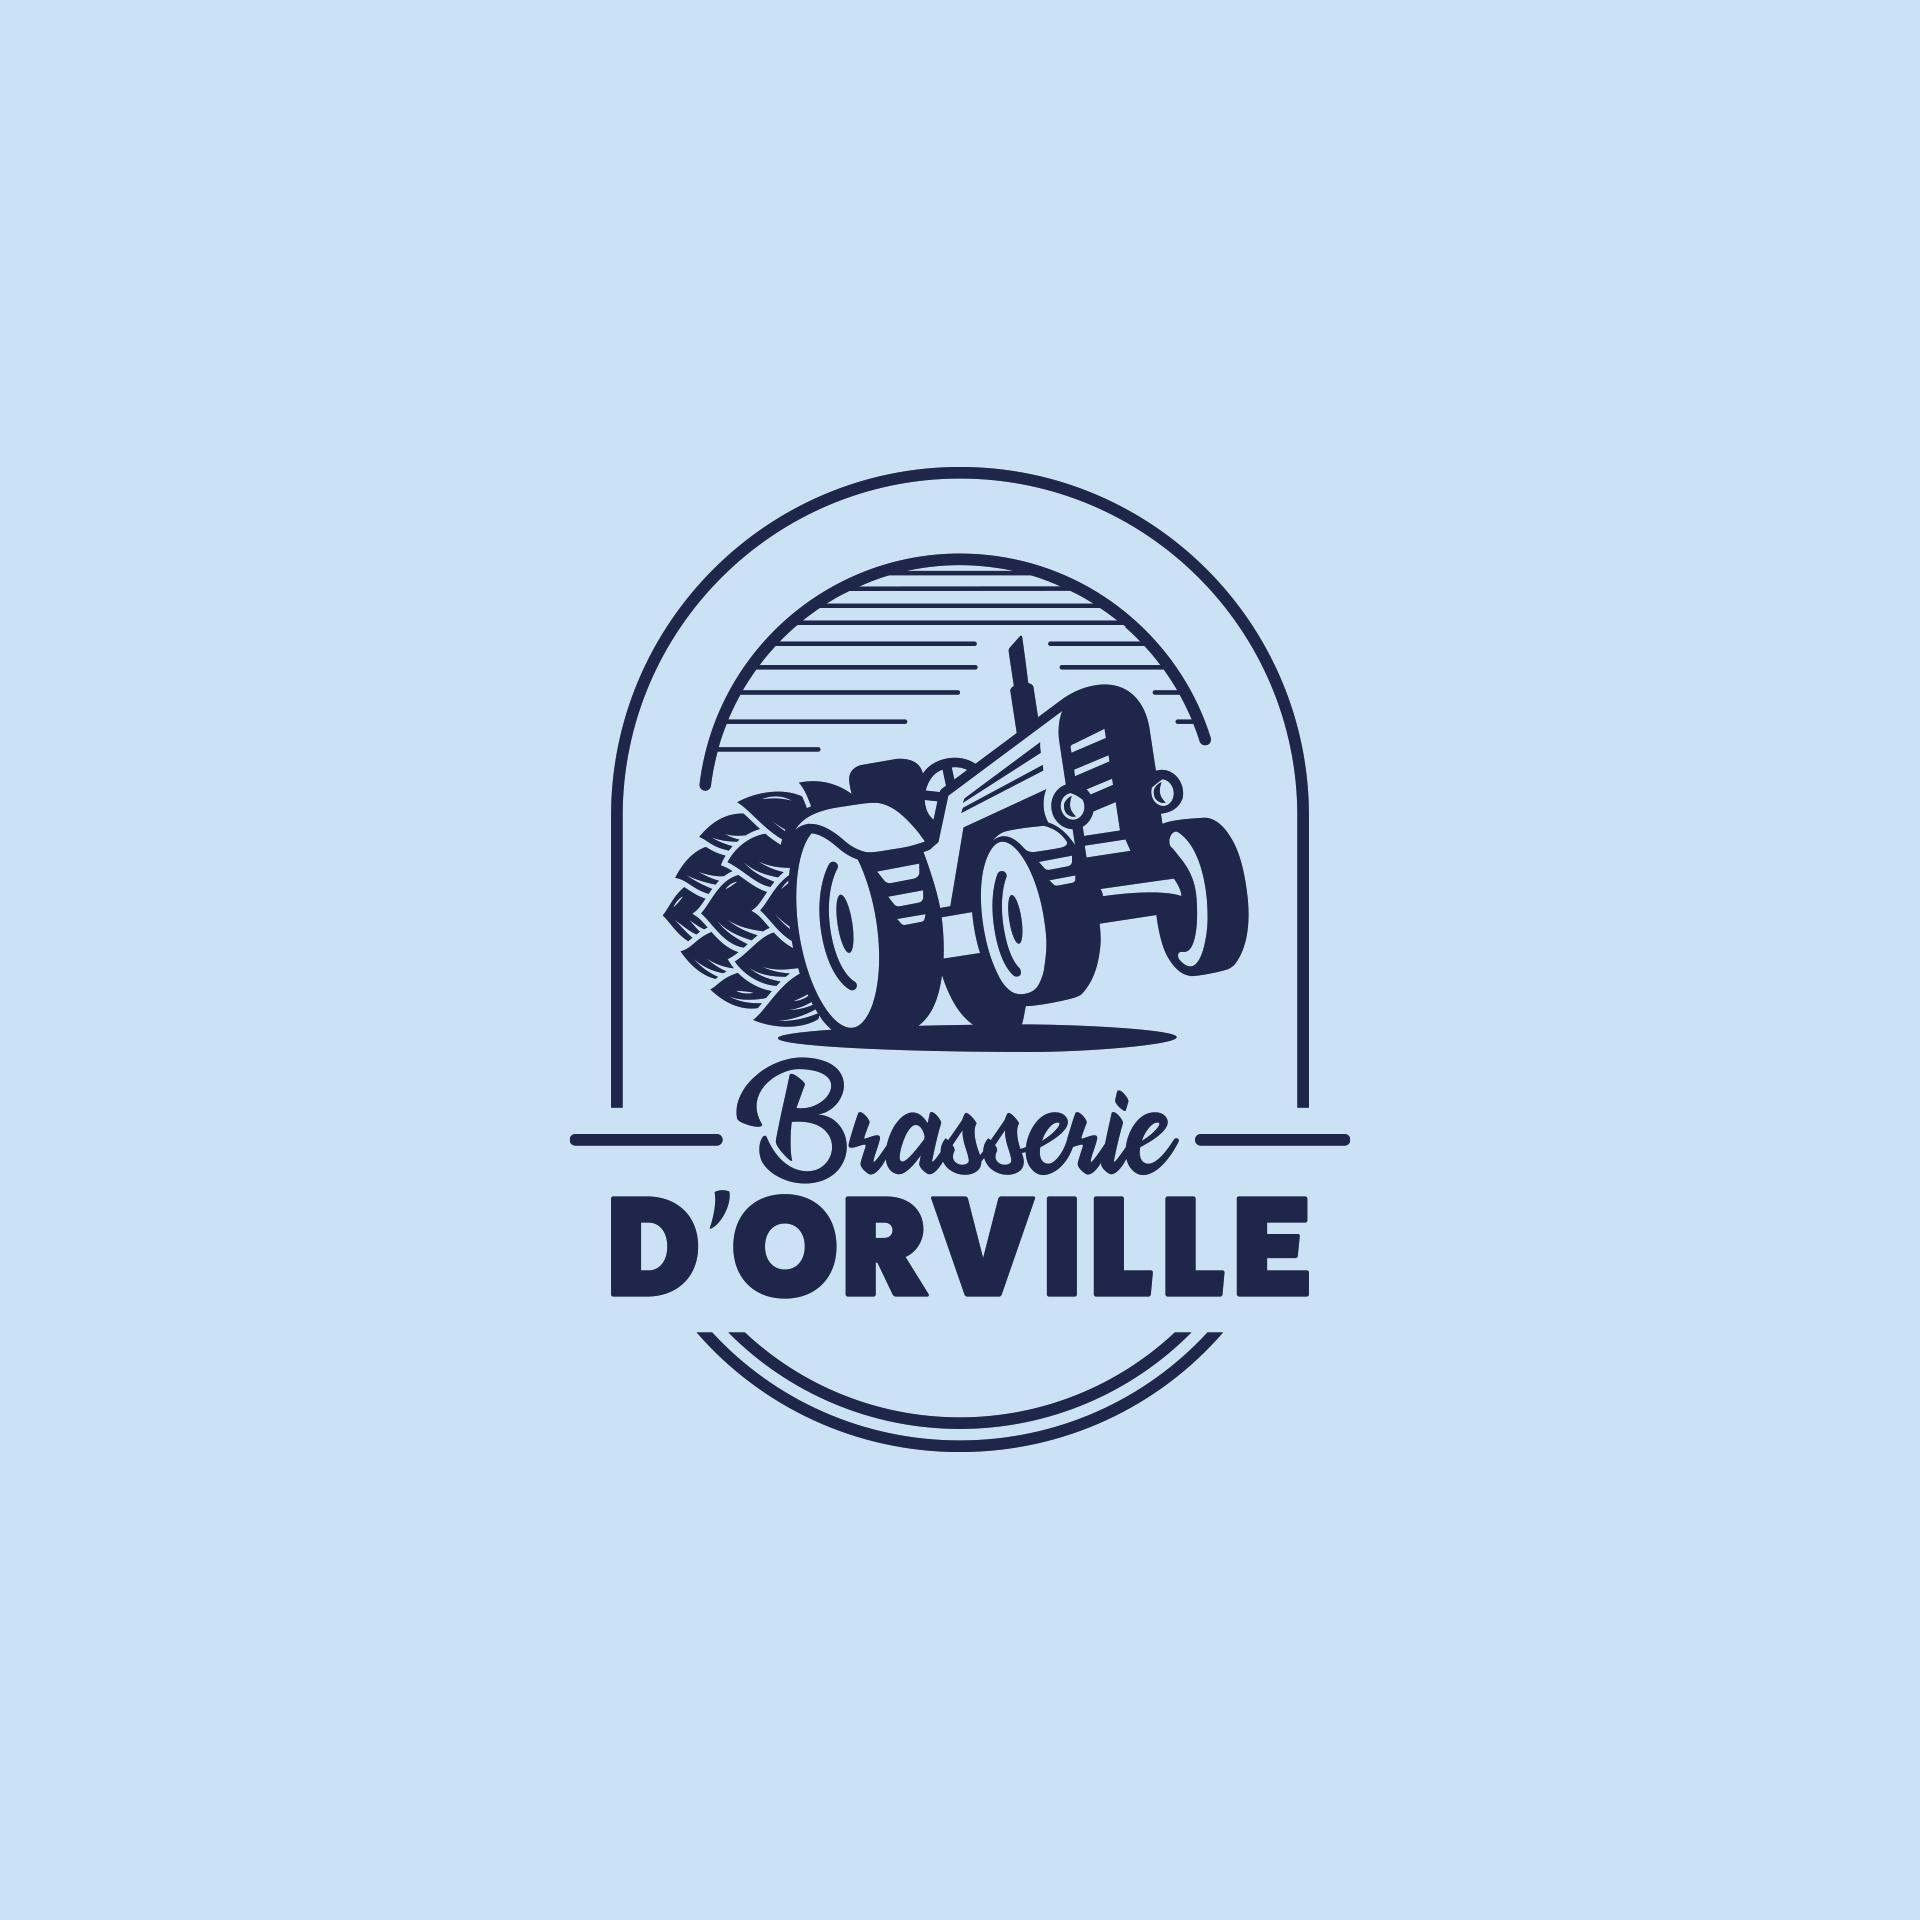 Brand Design Studio Redesign Craft Beer Brand From France